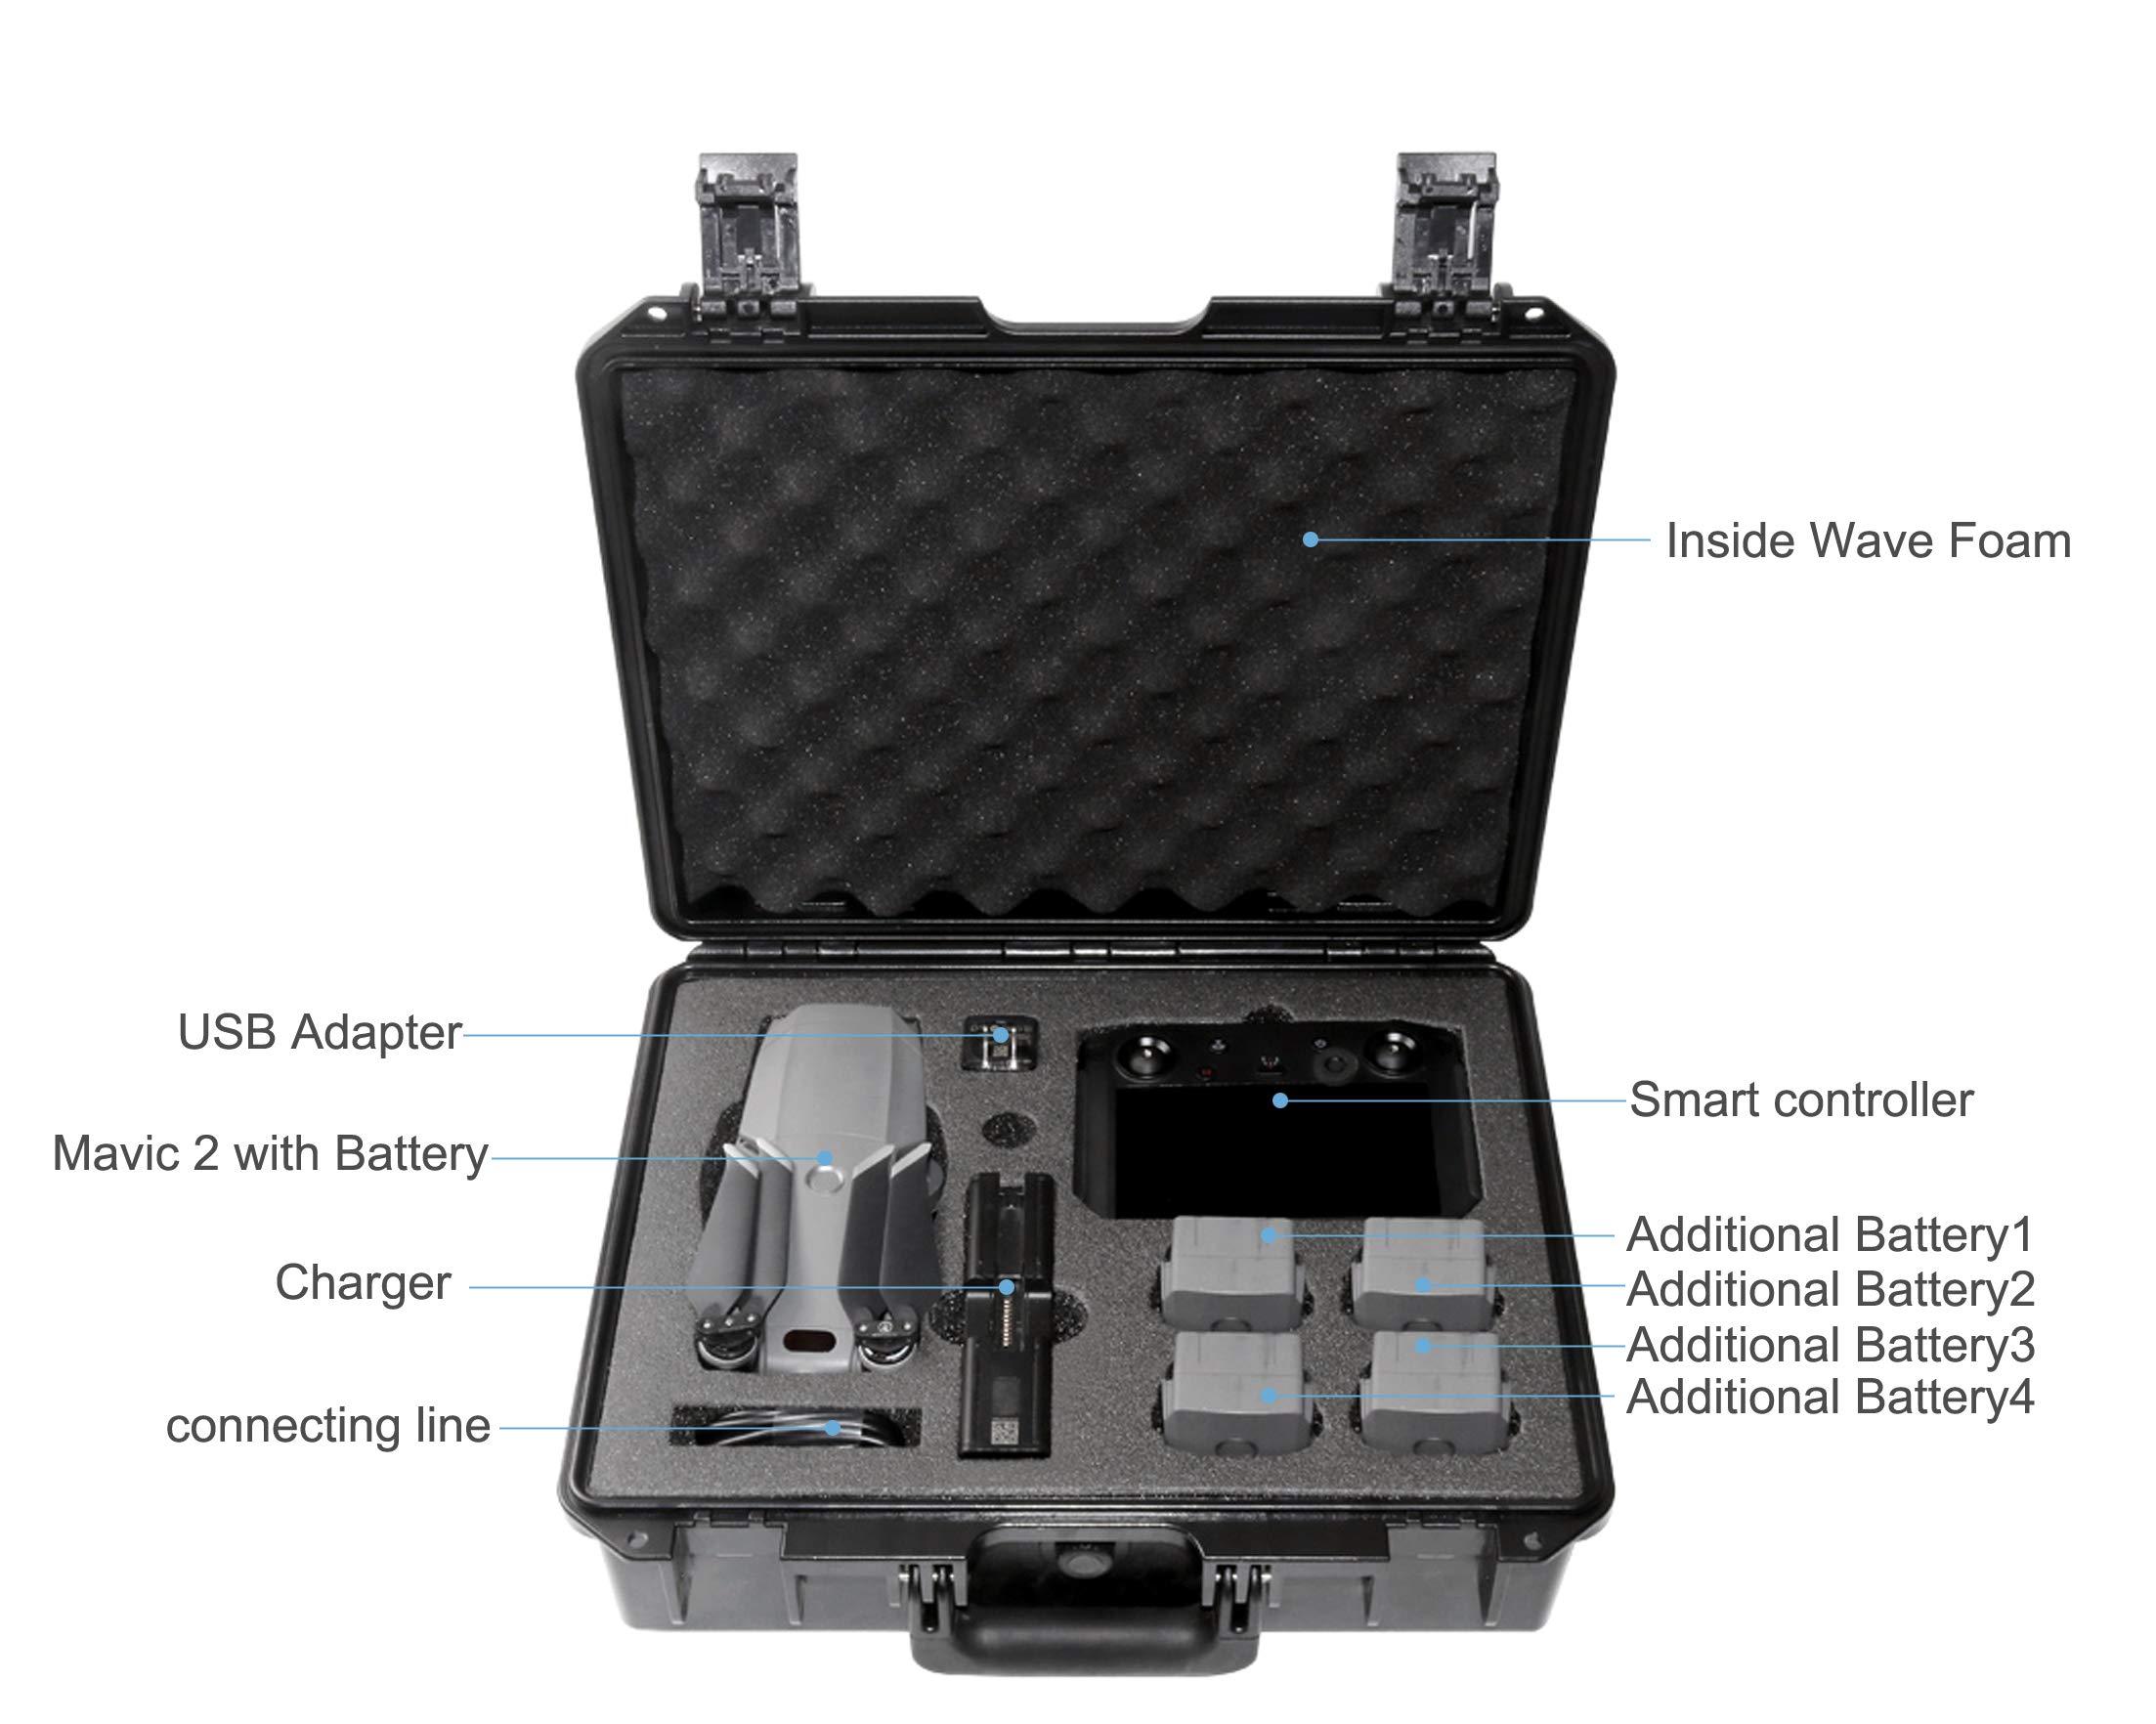 Koozam DJI Mavic 2 Waterproof Hard Case, with Smart Controller, for Mavic 2 Pro and Zoom Drones, Waterproof and Shockproof (for Mavic 2 with Smart Controller) by Koozam (Image #2)